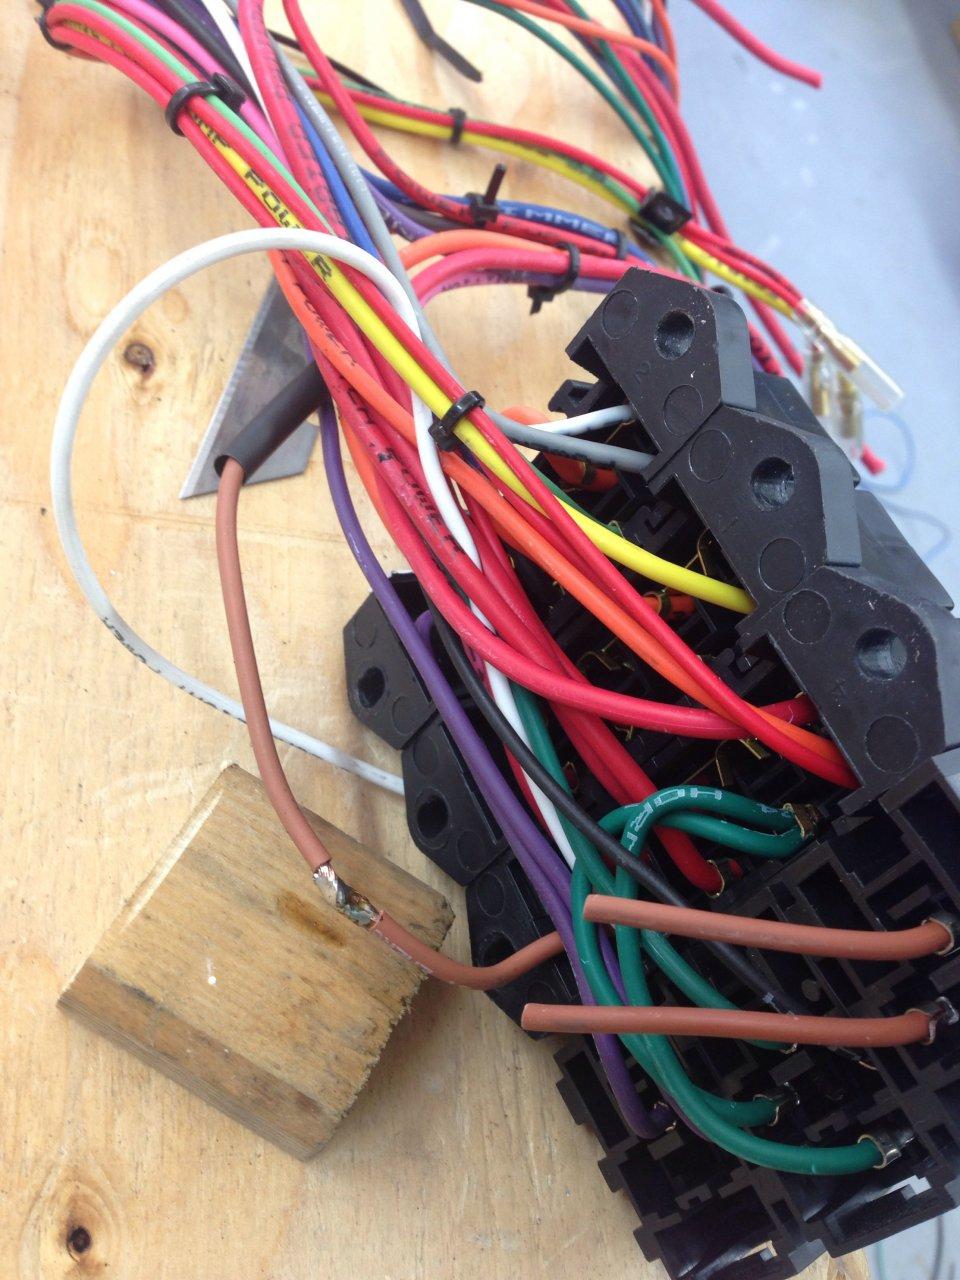 hazard light circuit wiring tip ih8mud forum ez wiring harness fj40 at suagrazia.org